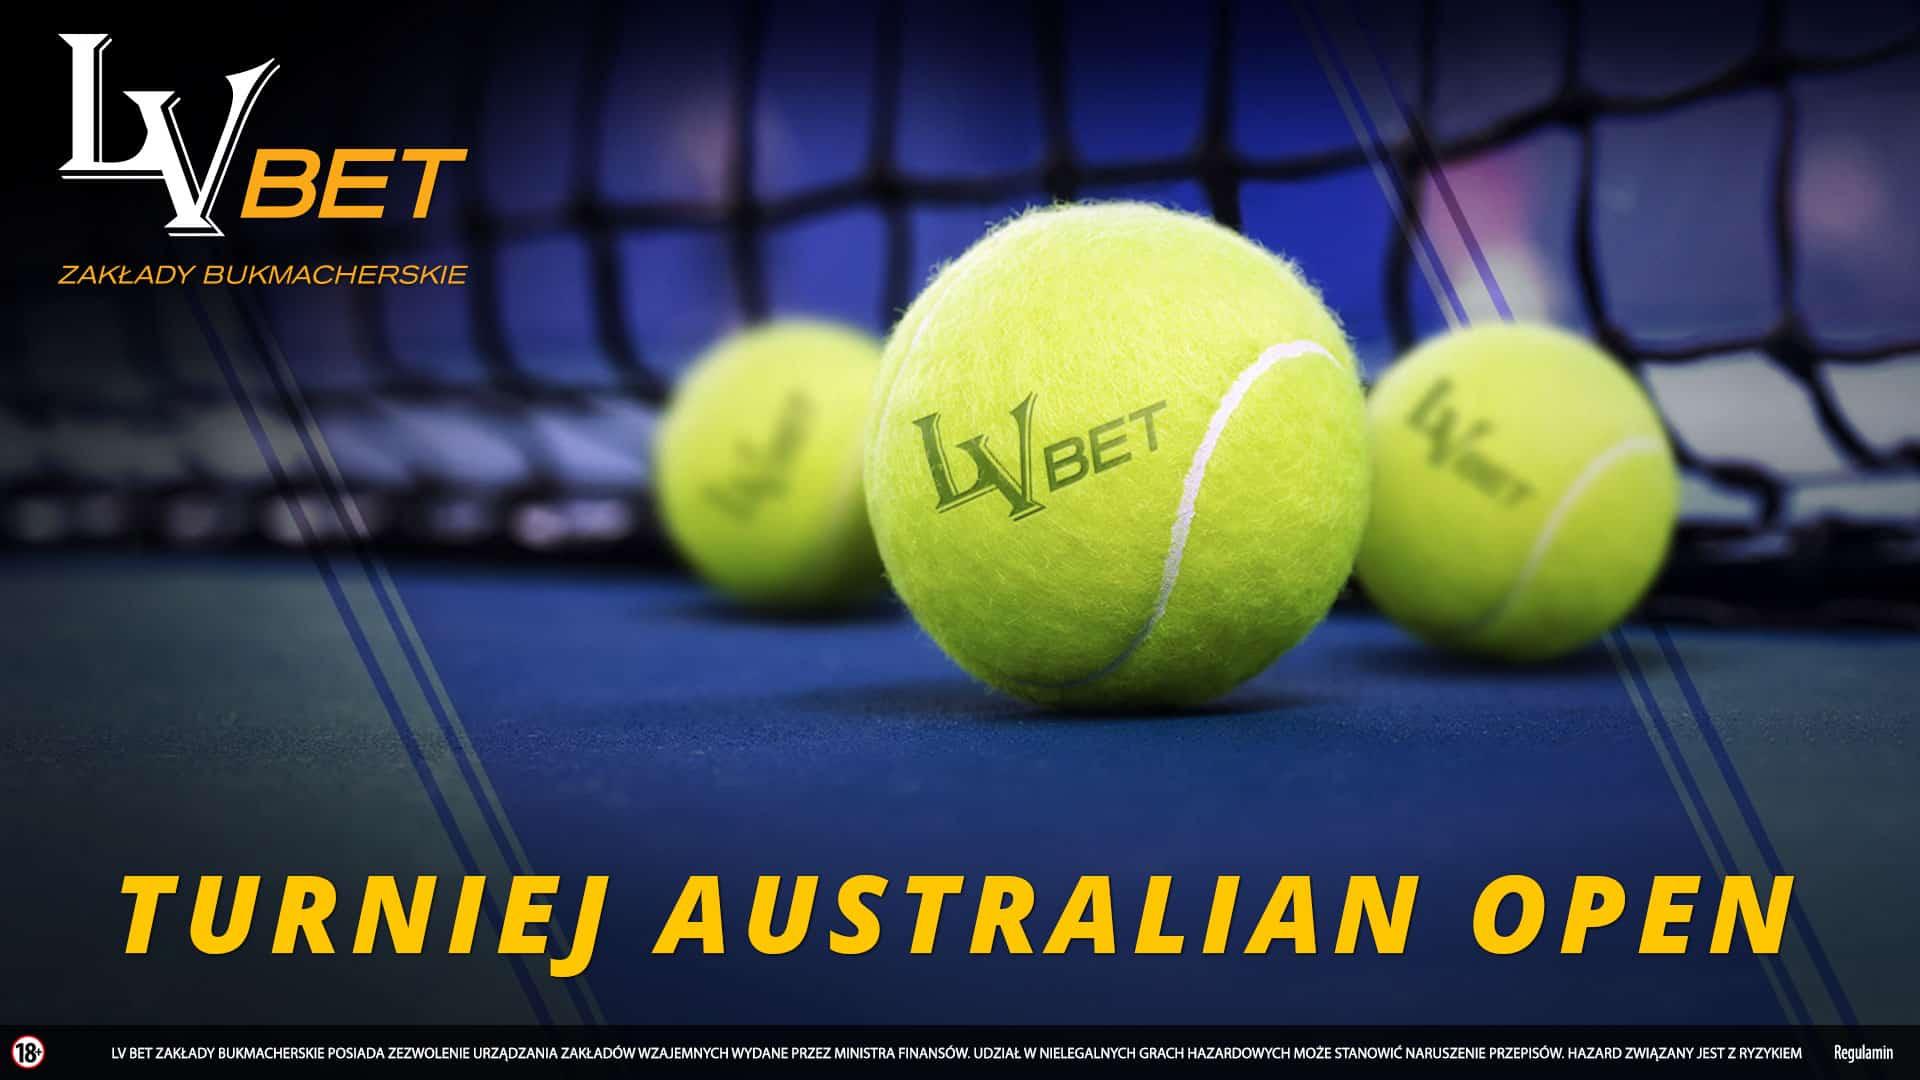 Photo of Konkurs z nagrodami LV BET. 2000 PLN na Australian Open!